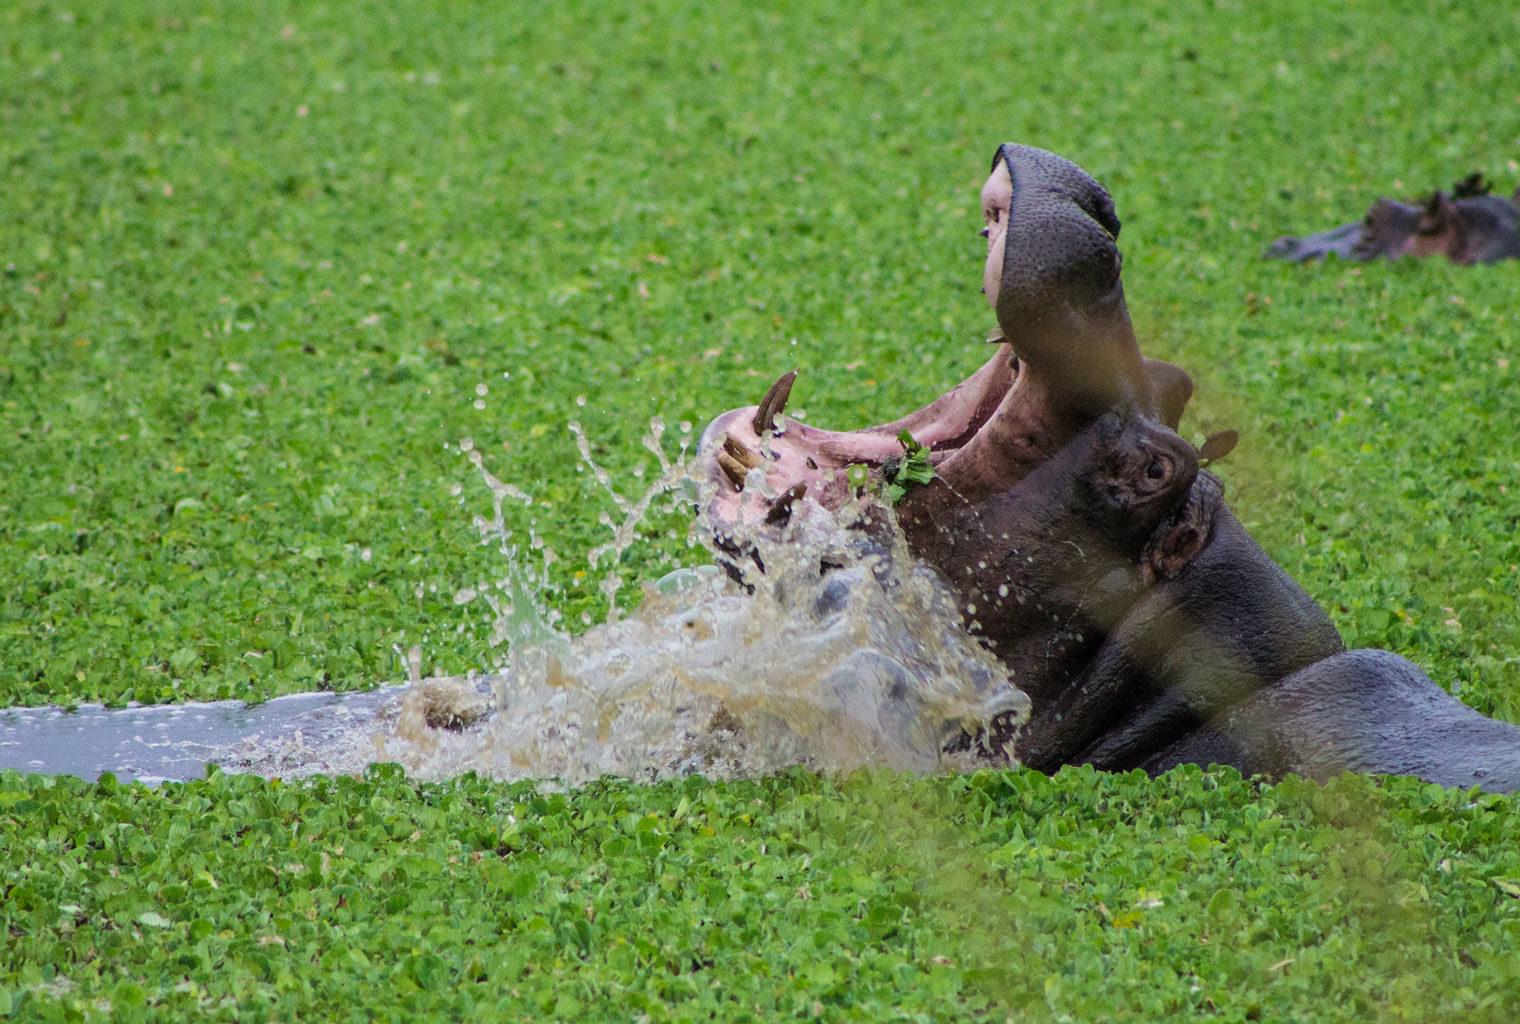 Kenya-House-In-The-Wild-Hippo